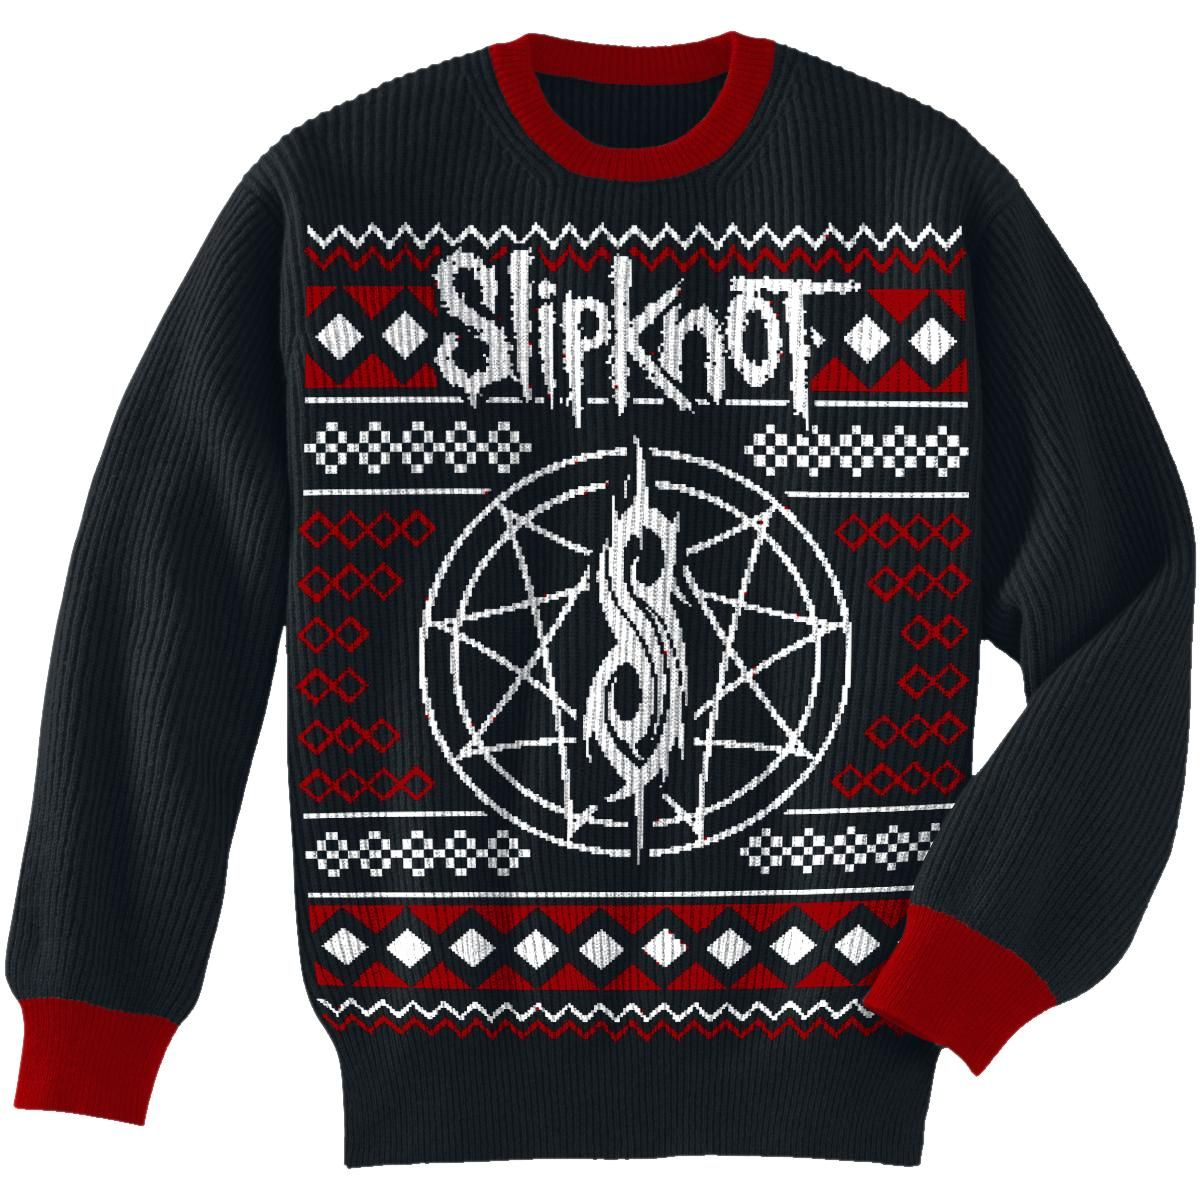 Holiday Sweater Holiday sweater, Sweaters, Buy clothes